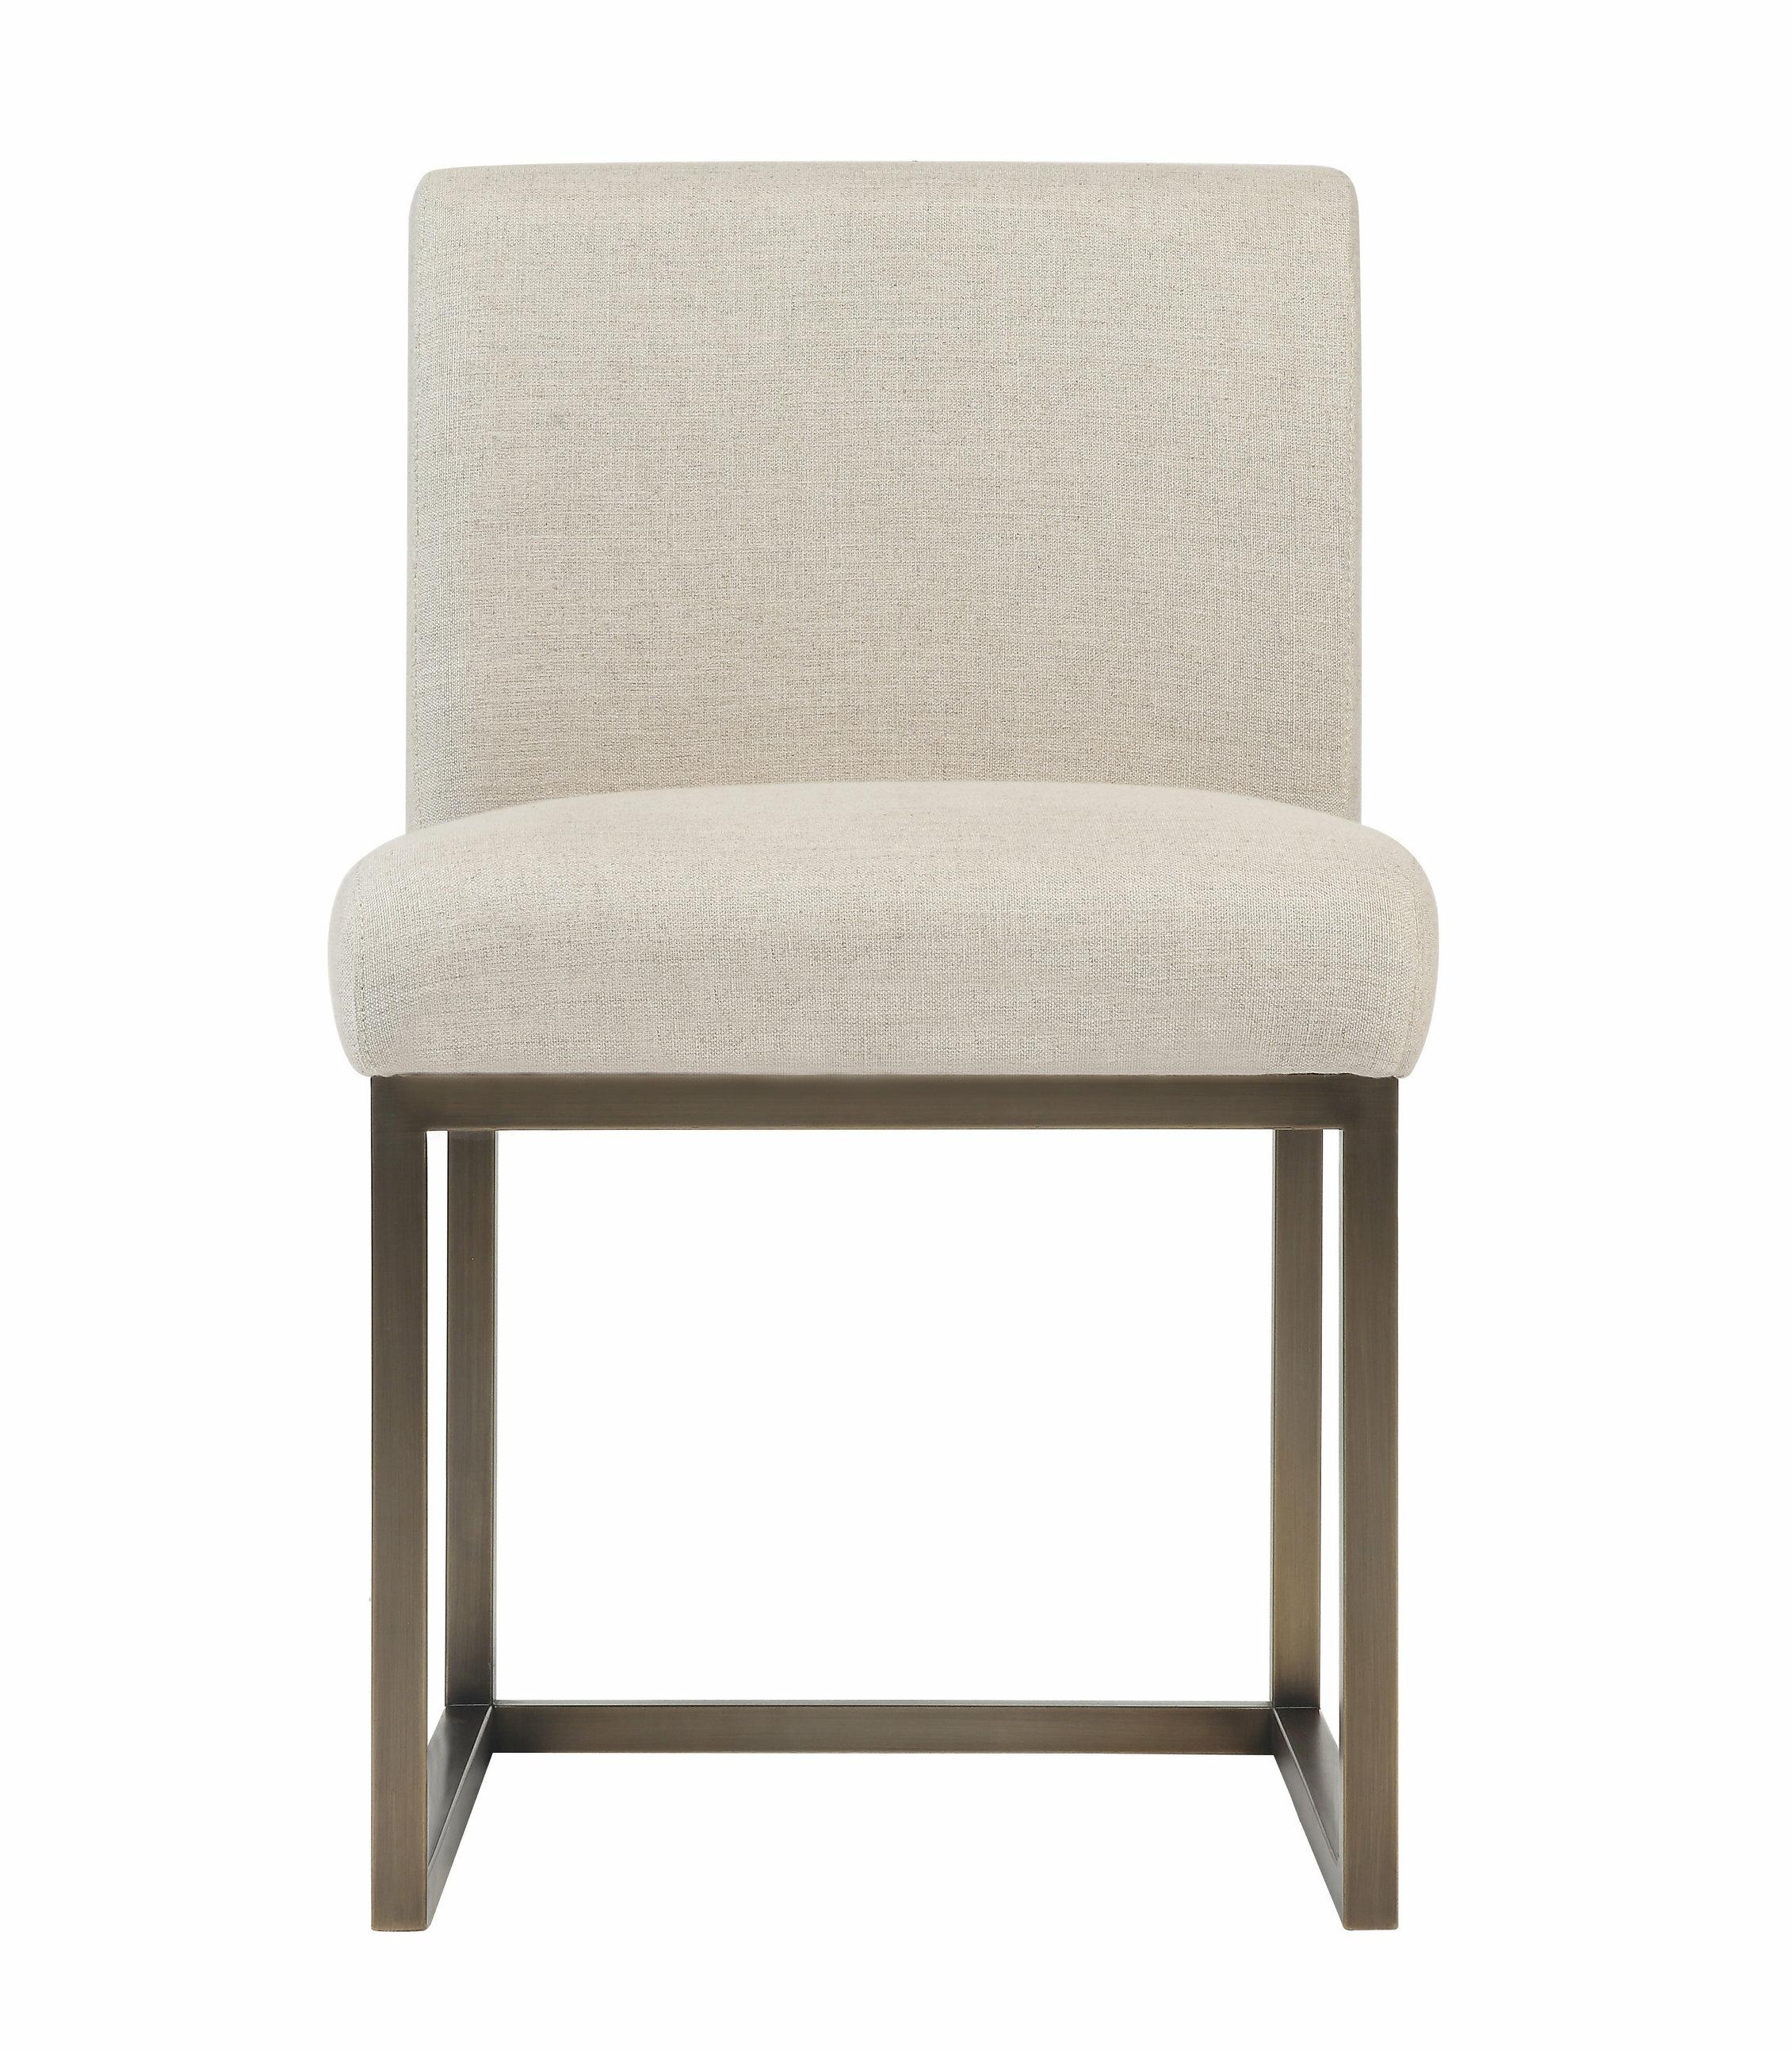 Allmodern Doherty Upholstered Dining Chair Reviews Wayfair